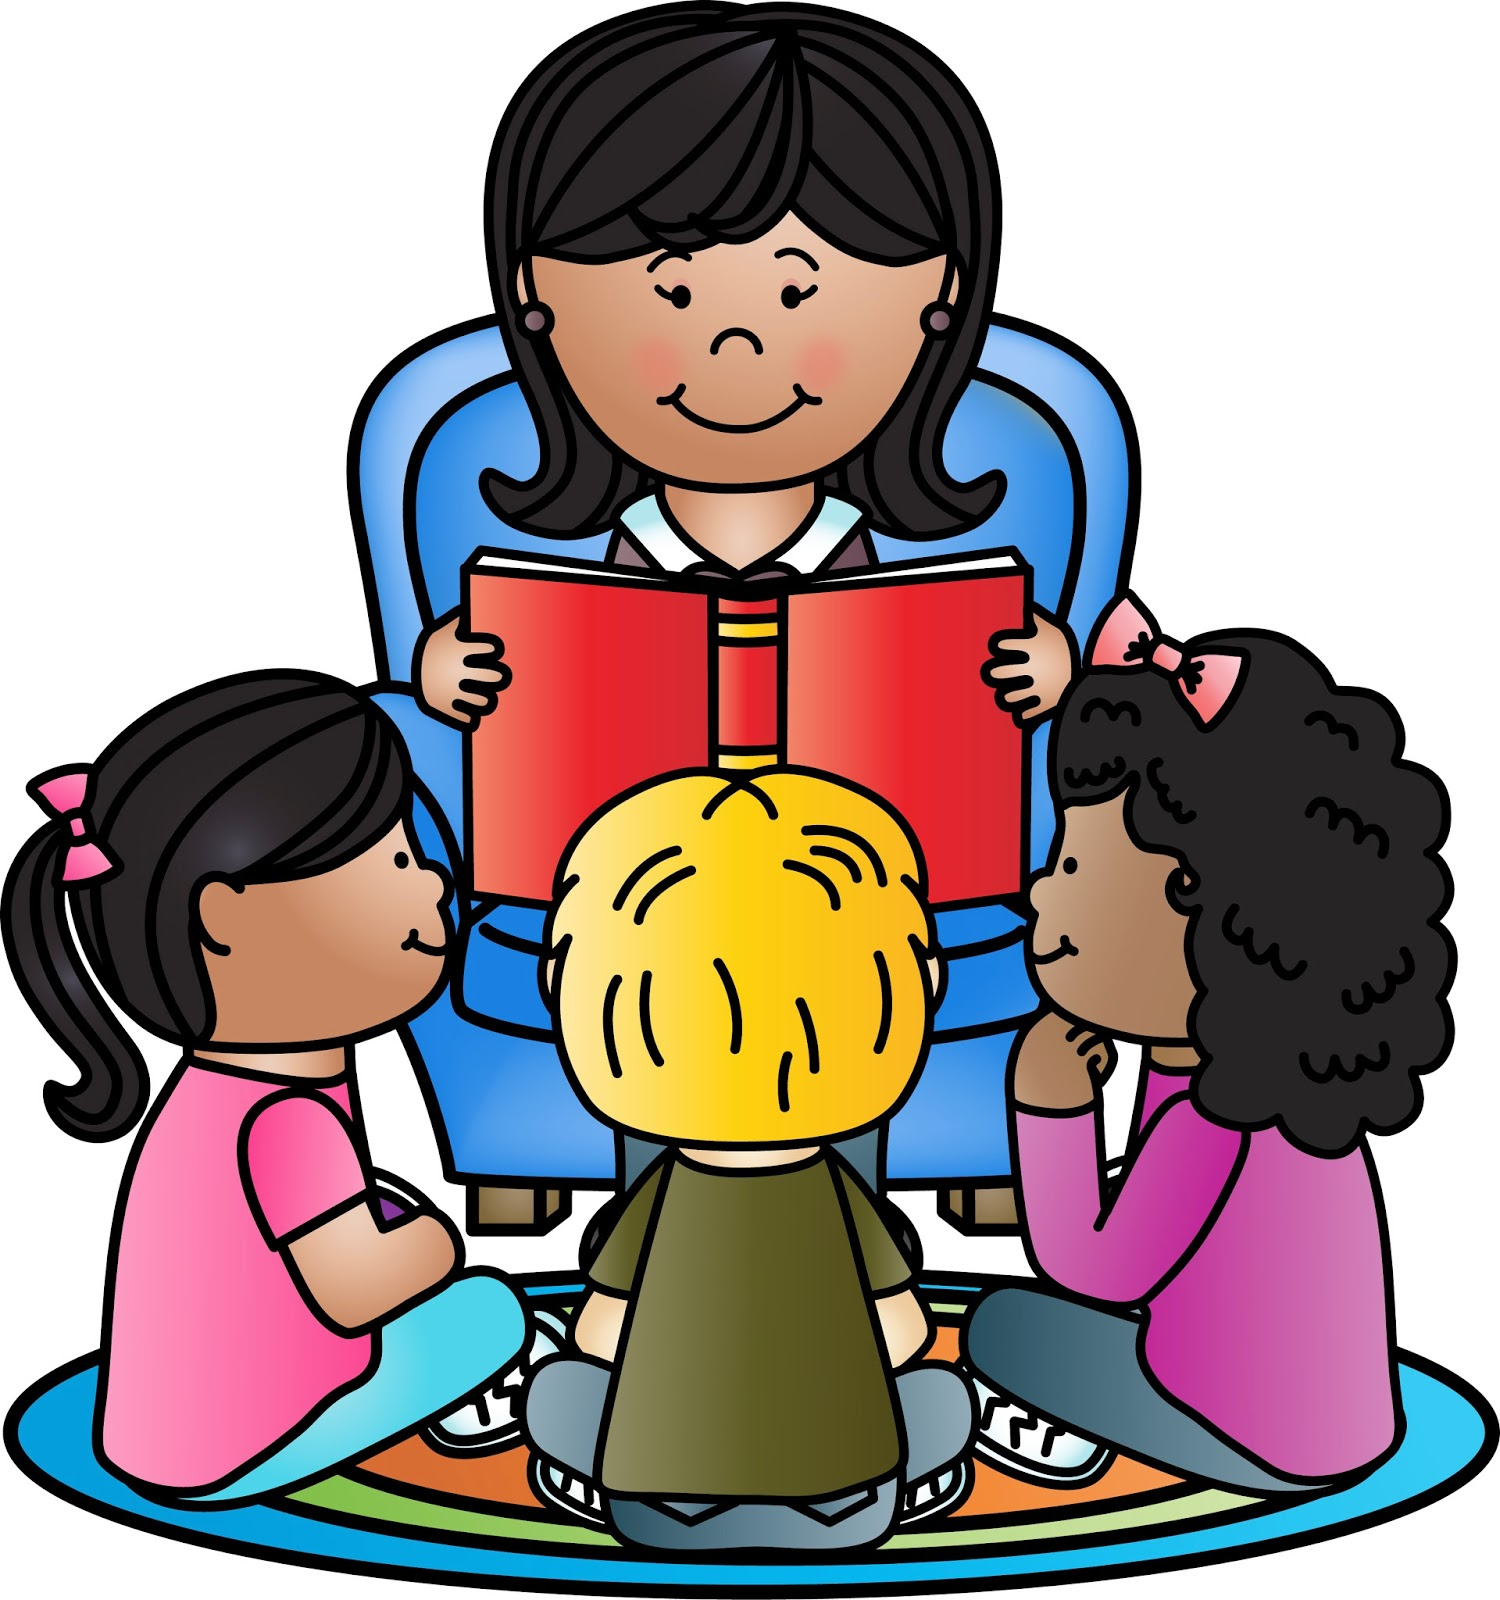 Clipart teacher teaching child. Free clip art download